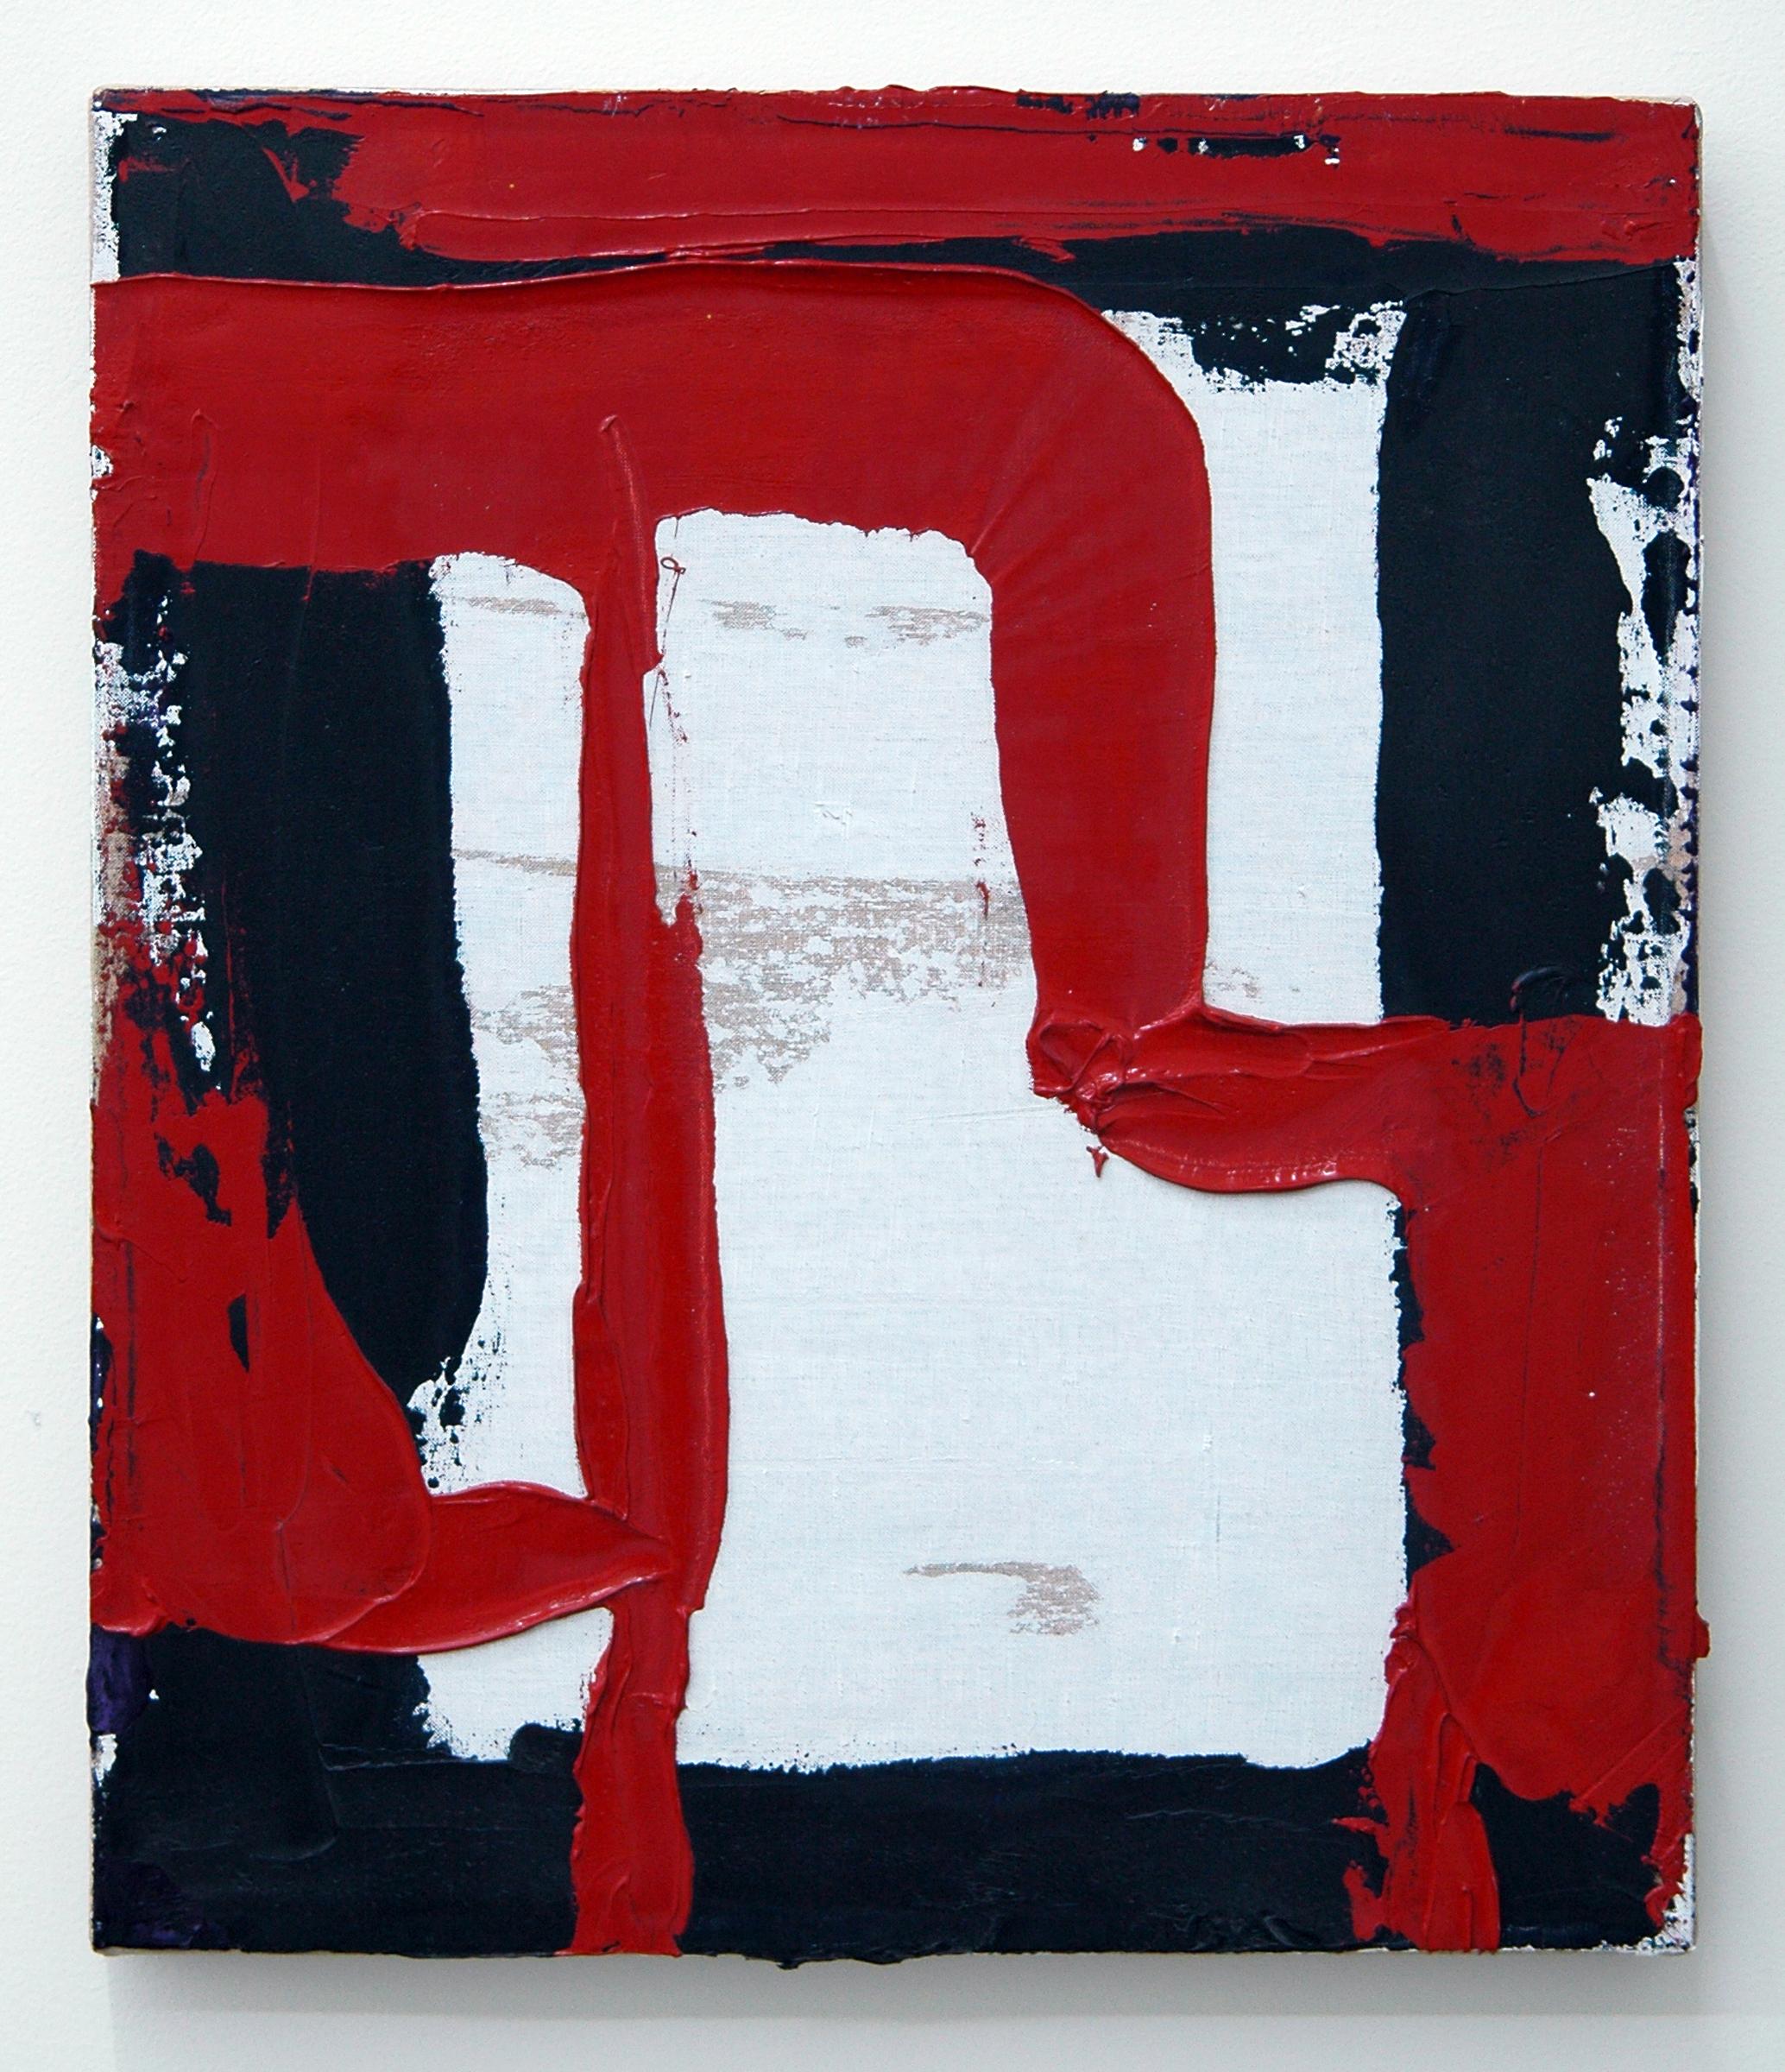 "/SLASH/  Peter Kirkeby, Untitled, oil and rabbit skin glue on linen, 13"" x 11"", 2013"